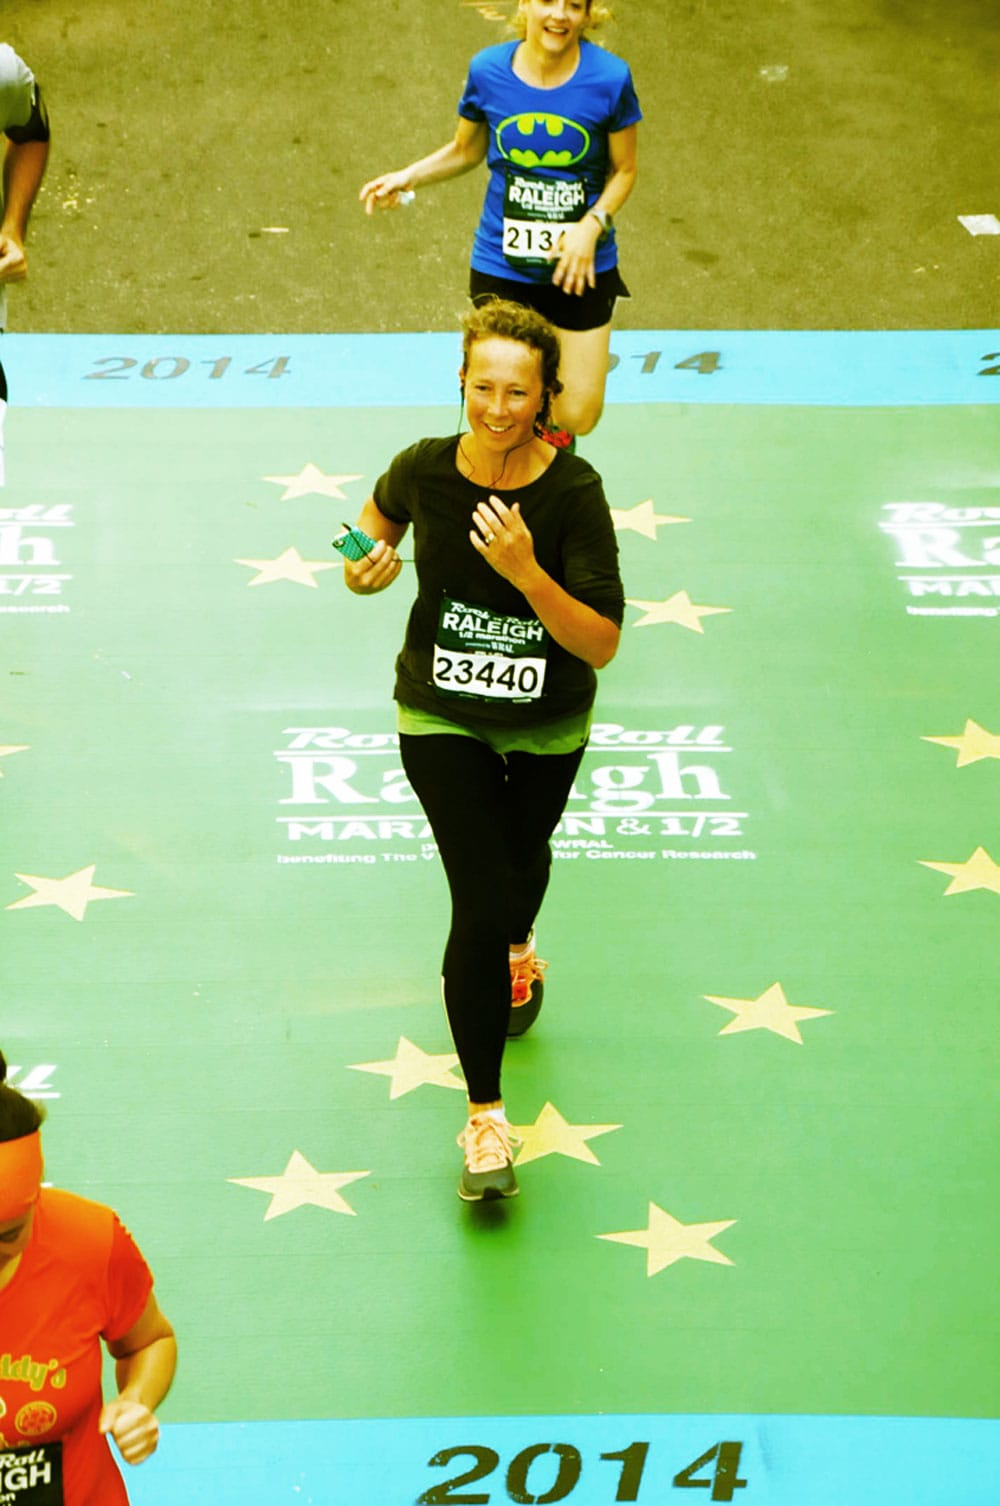 Crossing the finish line of the half marathon last year.